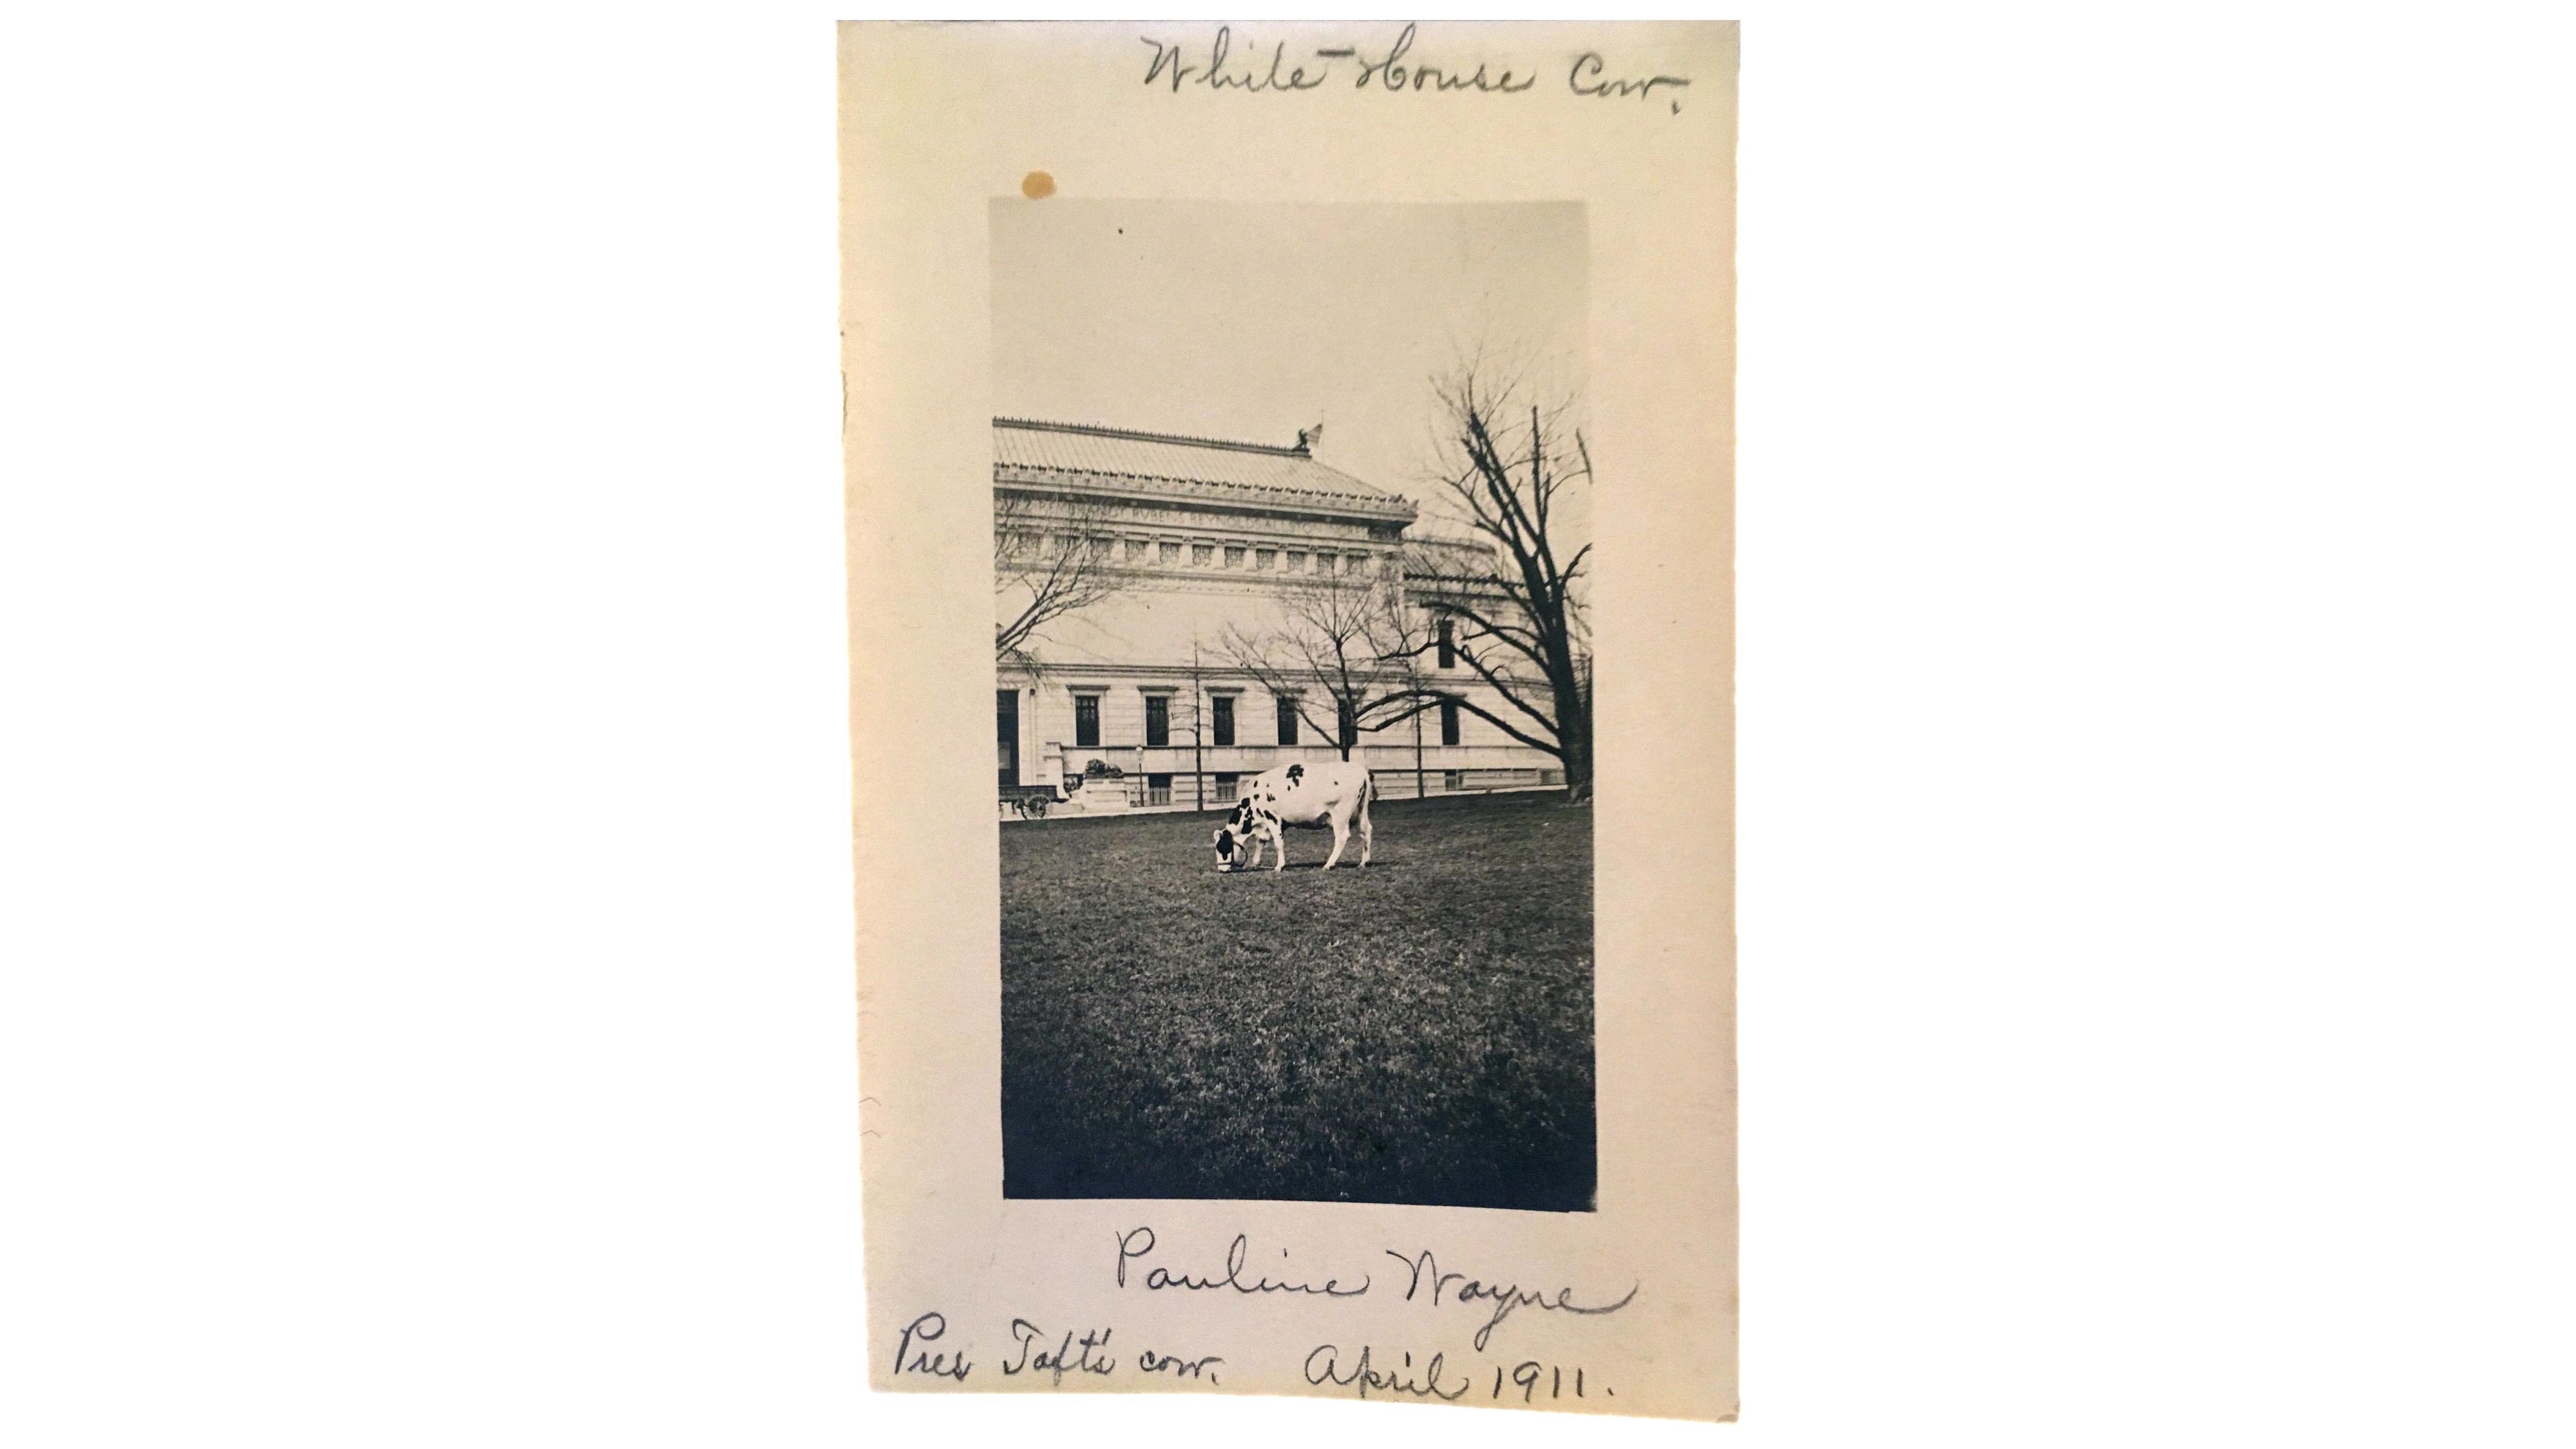 Greetings From Washington The George Washington University Museum